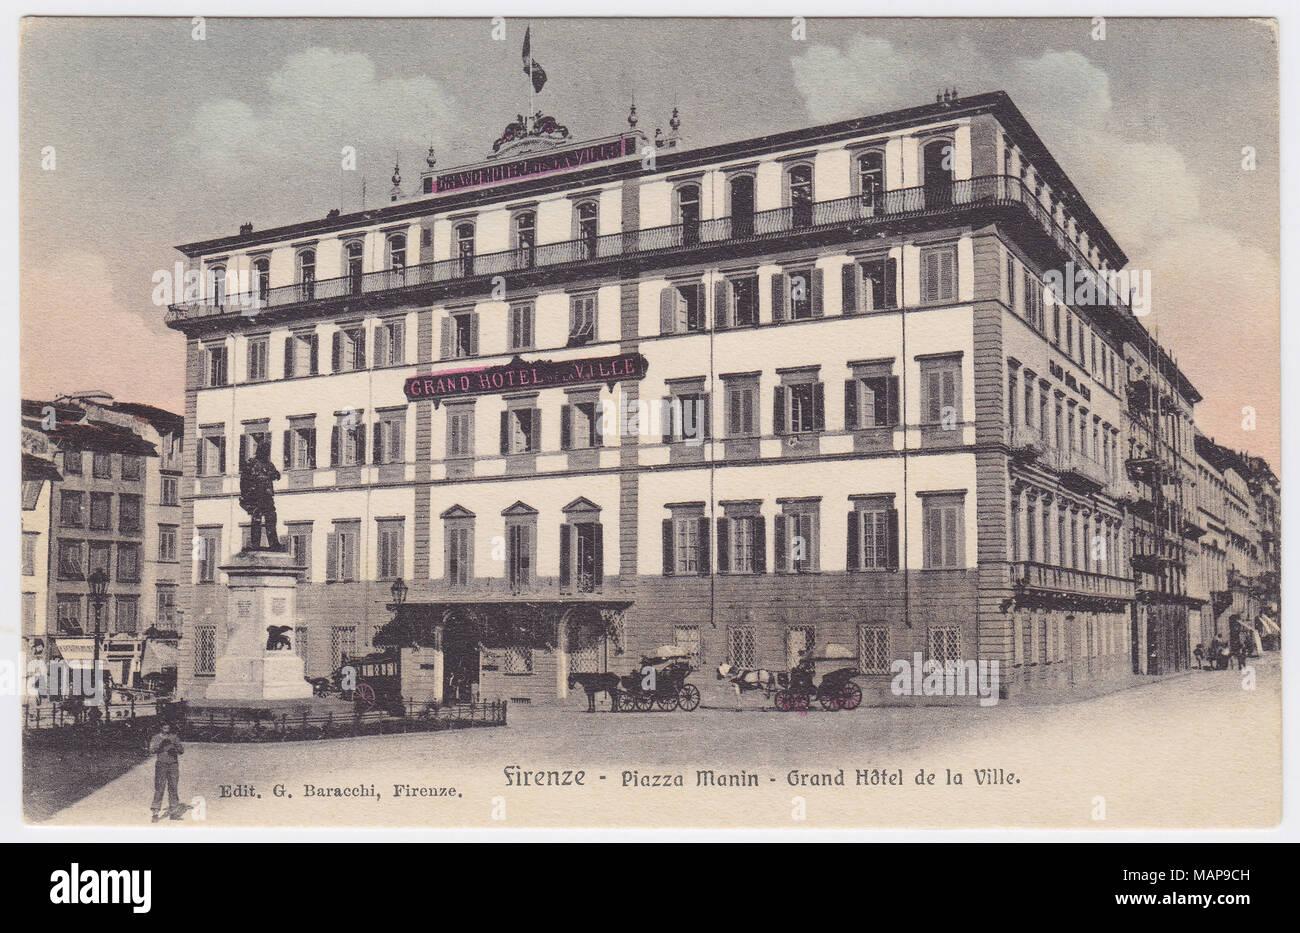 Grand Hotel de la Ville & Piazza Ognissanti, Florence, Italy - Stock Image